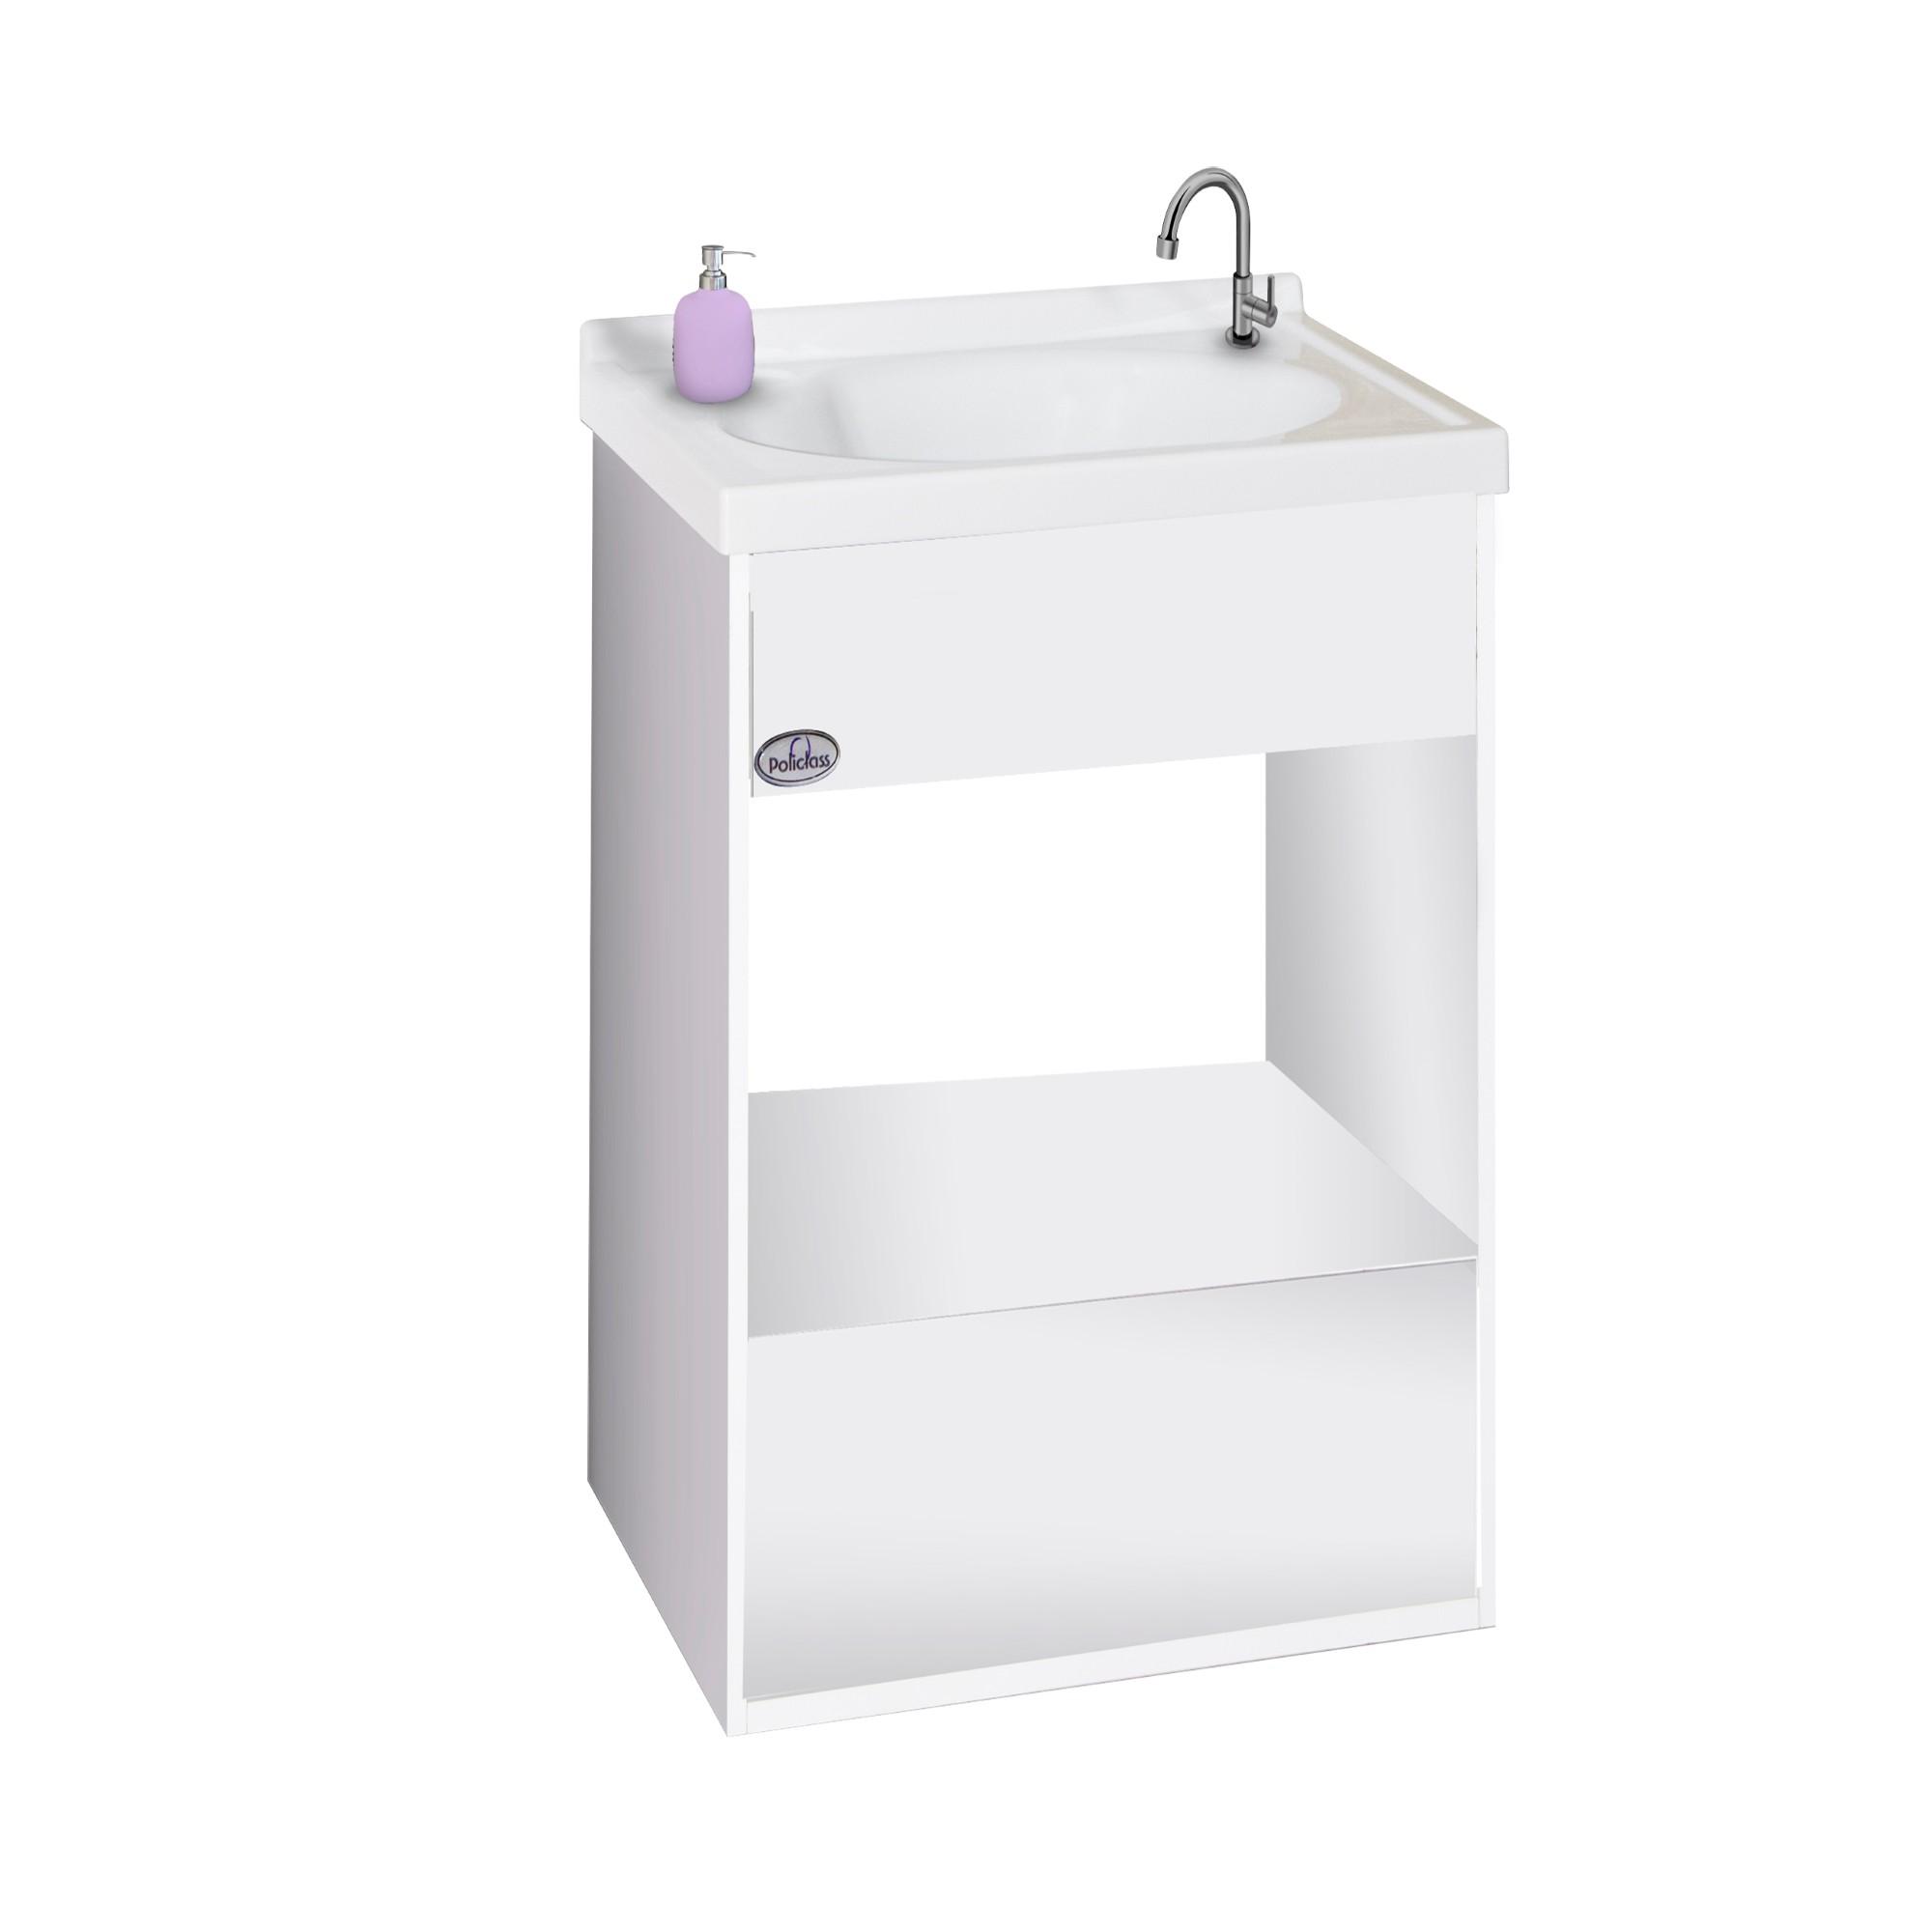 Gabinete para Banheiro 56x385cm Branco Pop 114010422 - Policlass